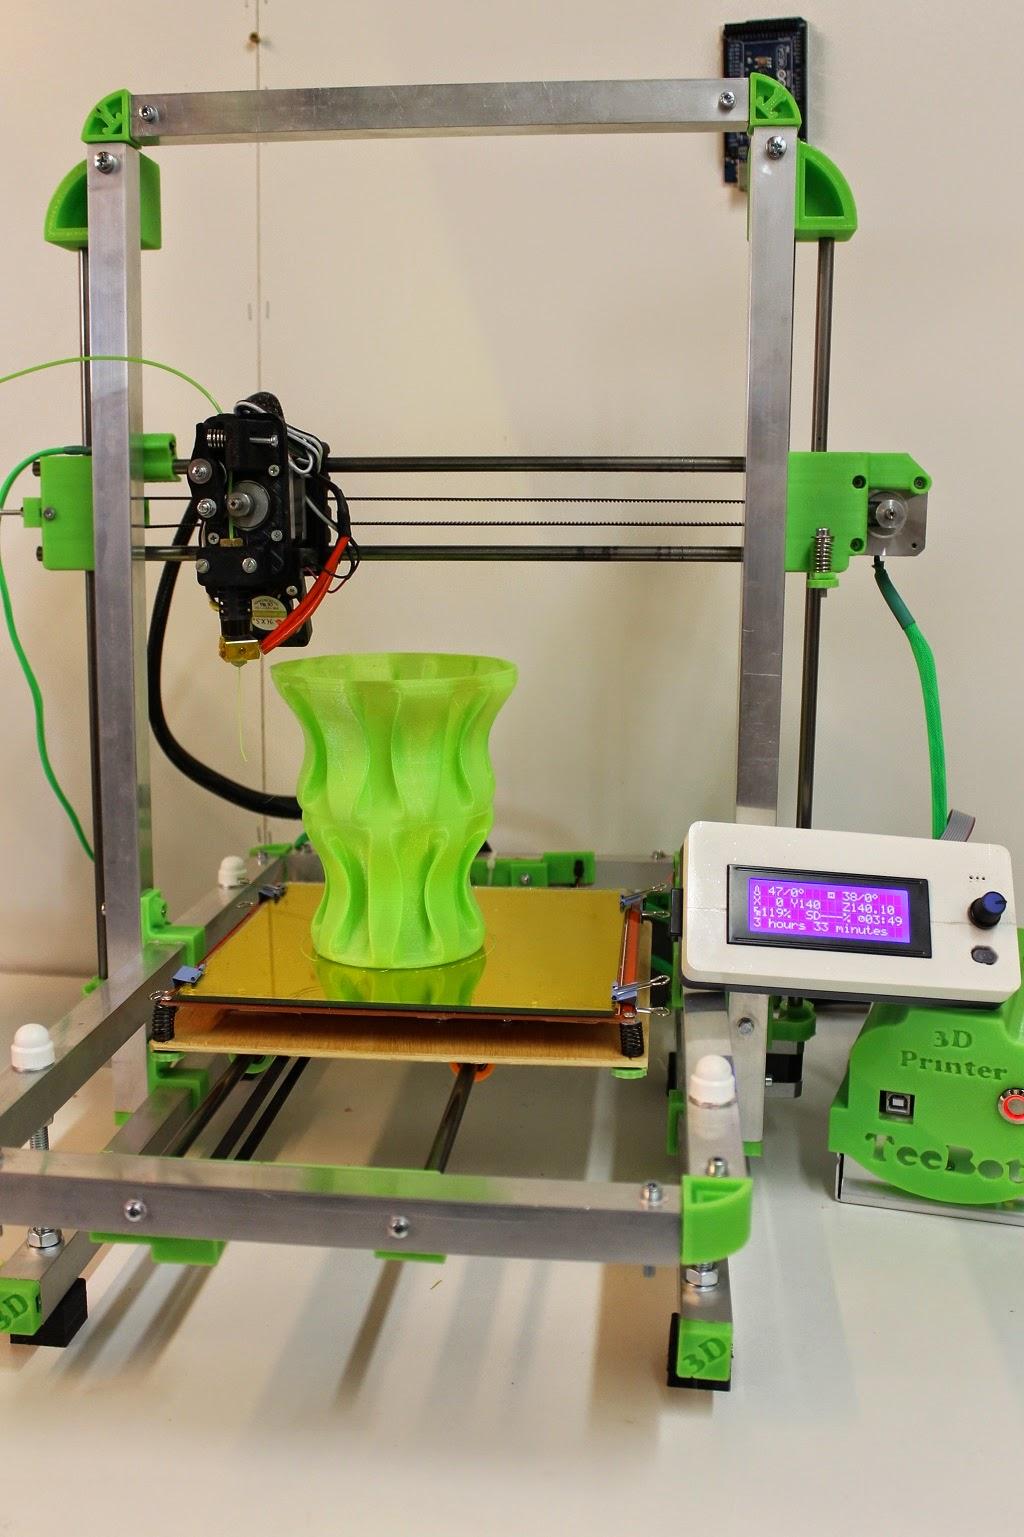 DIY 3D Printing: TeeBotMax Open Source Folding 3d Printer